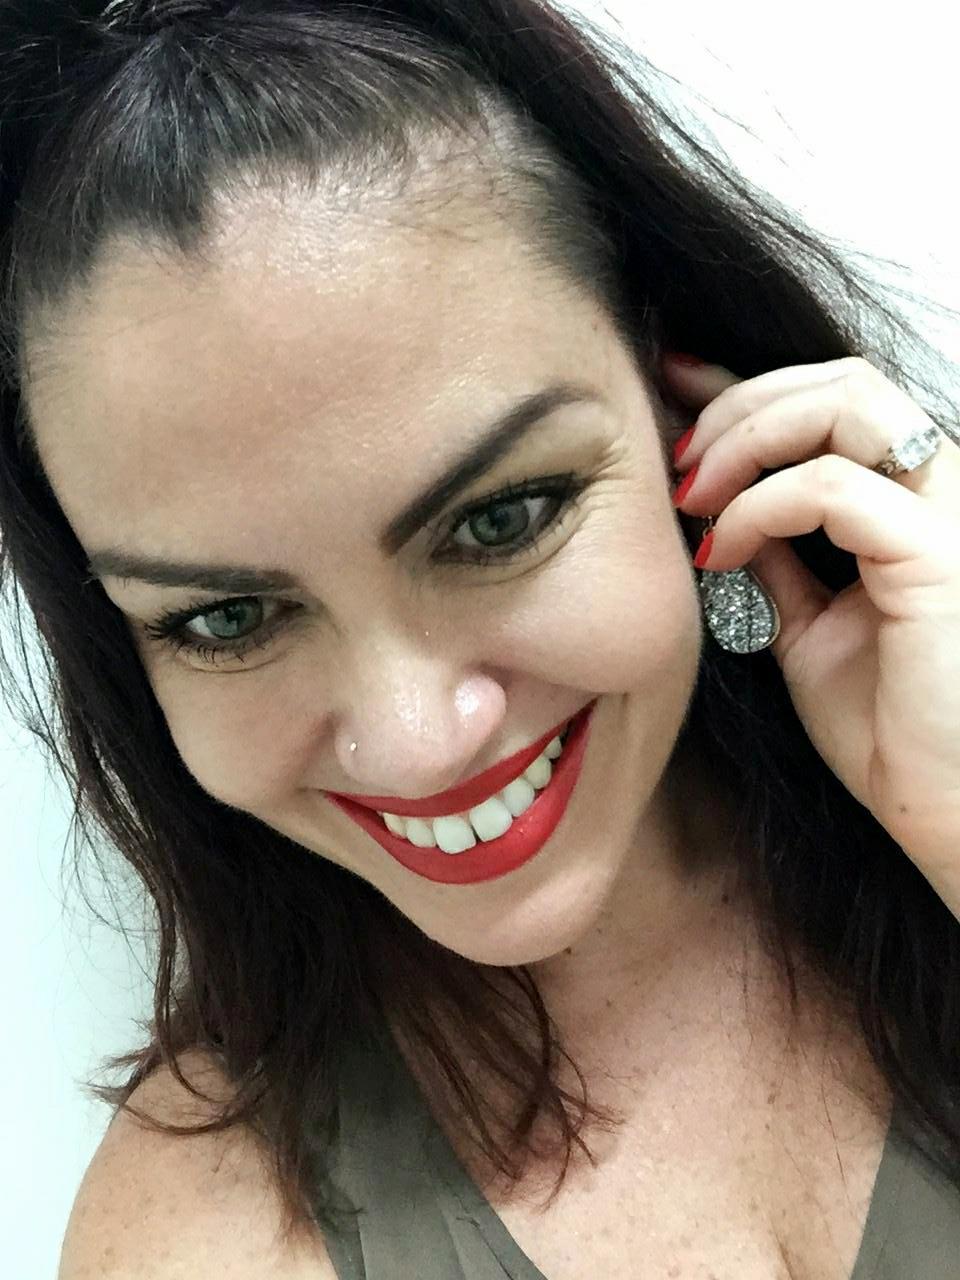 samantha clark smile white teeth arbonne lipstick red